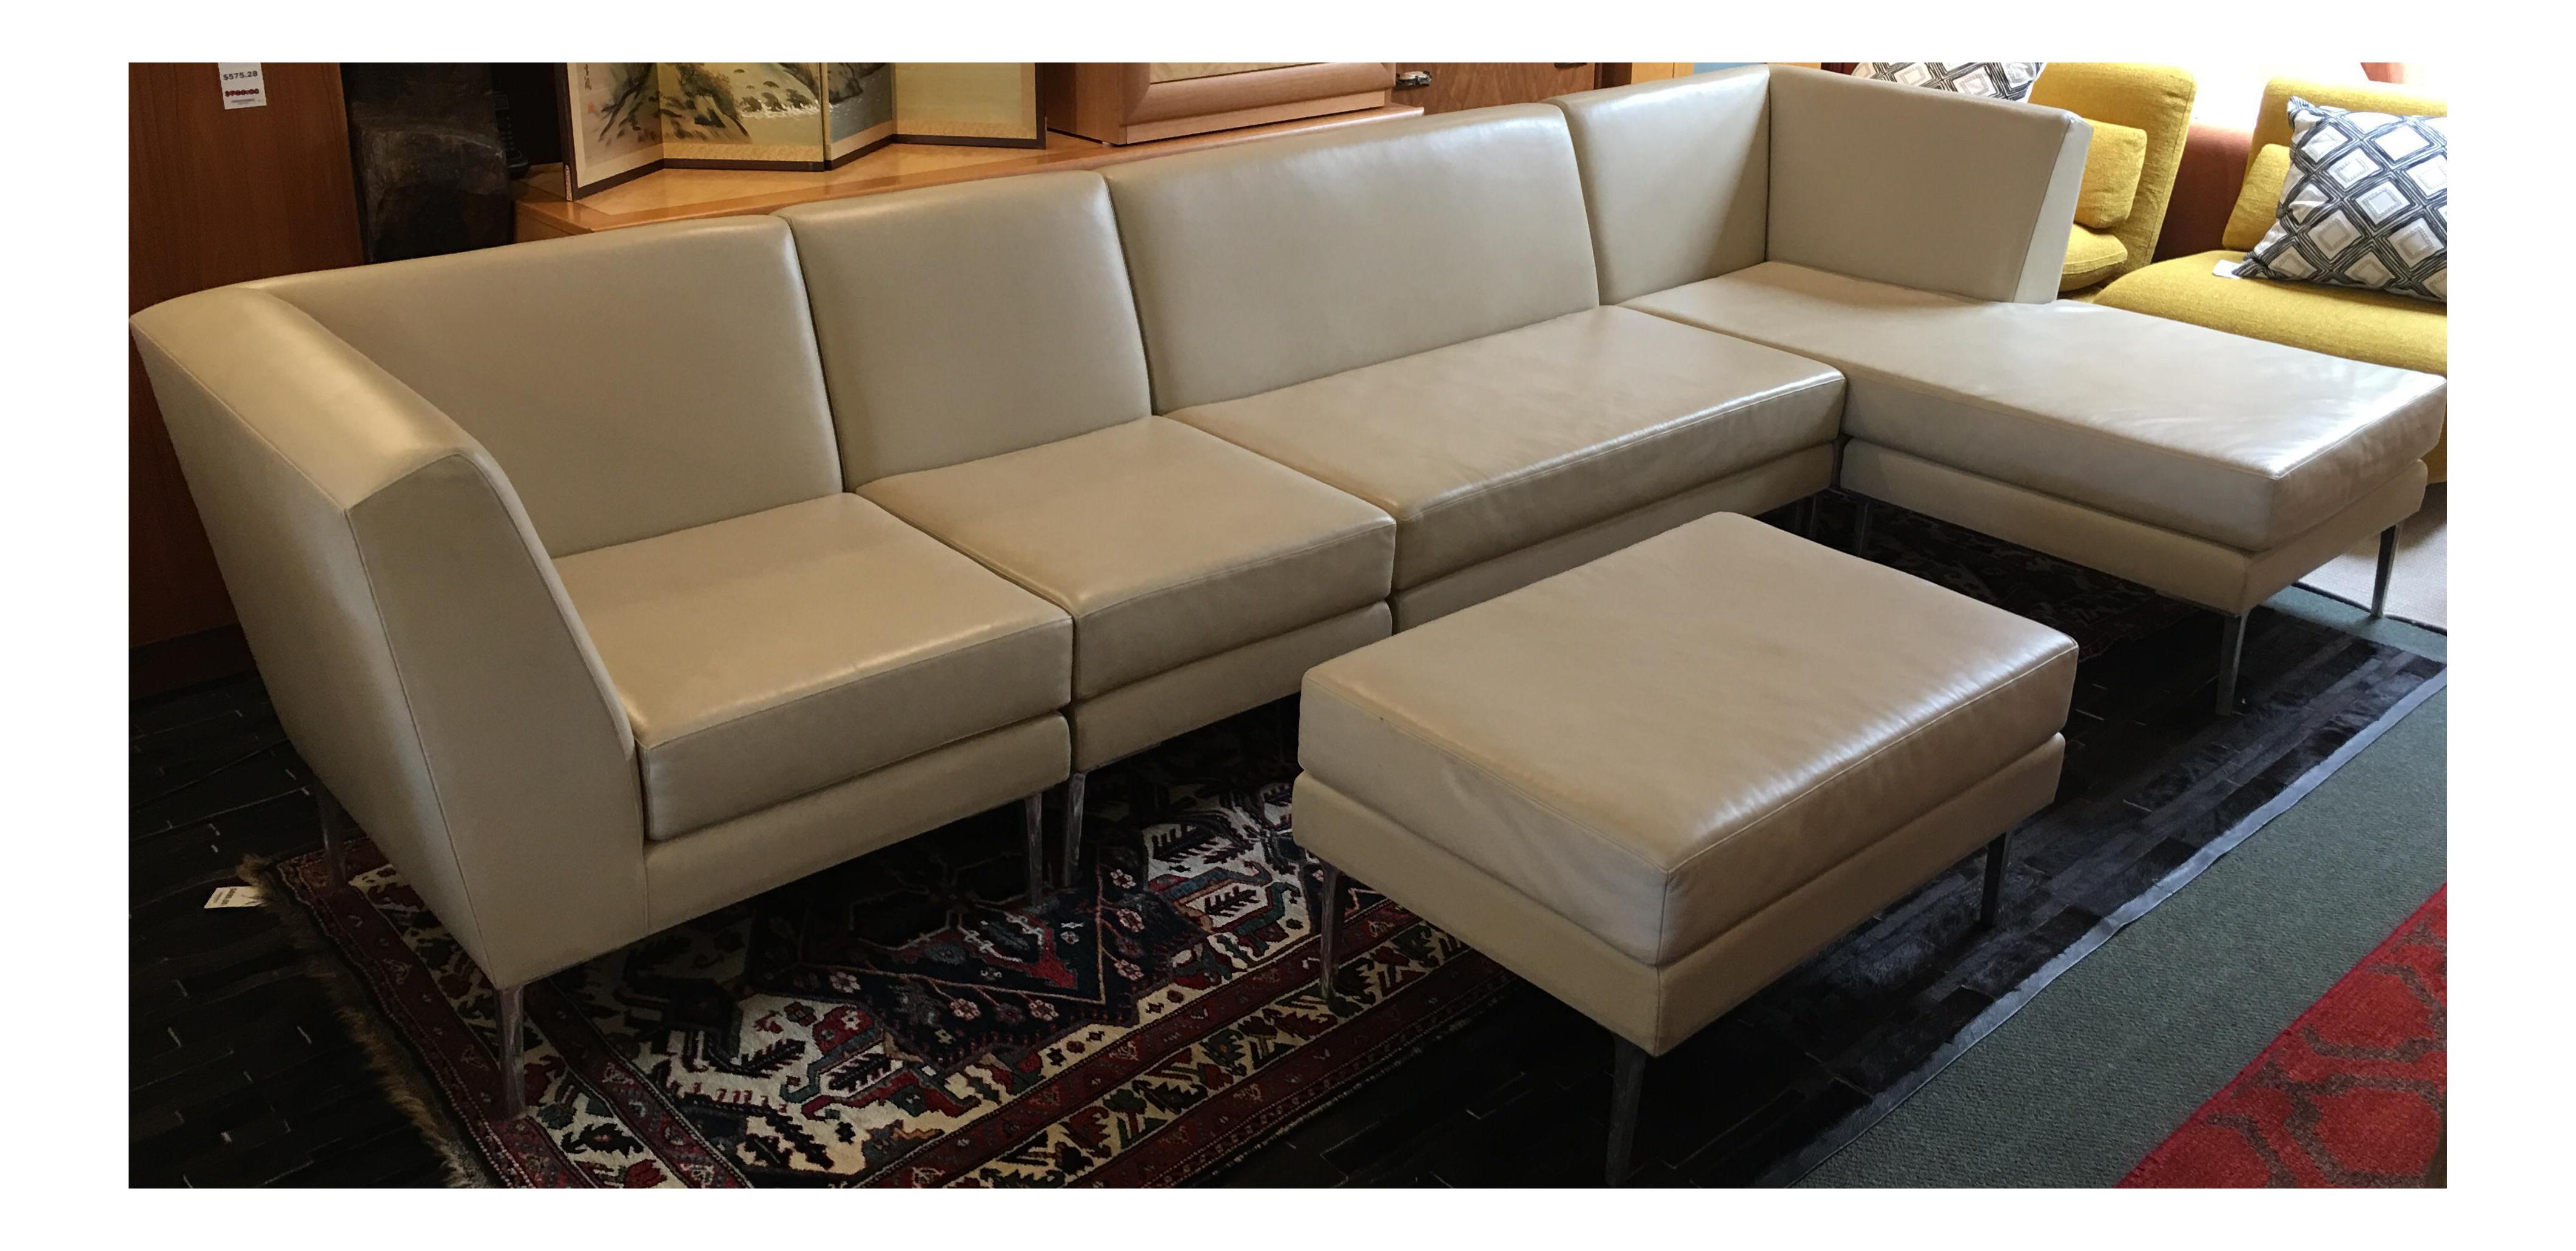 Custom Galerkin Ivory Leather Sectional Sofa